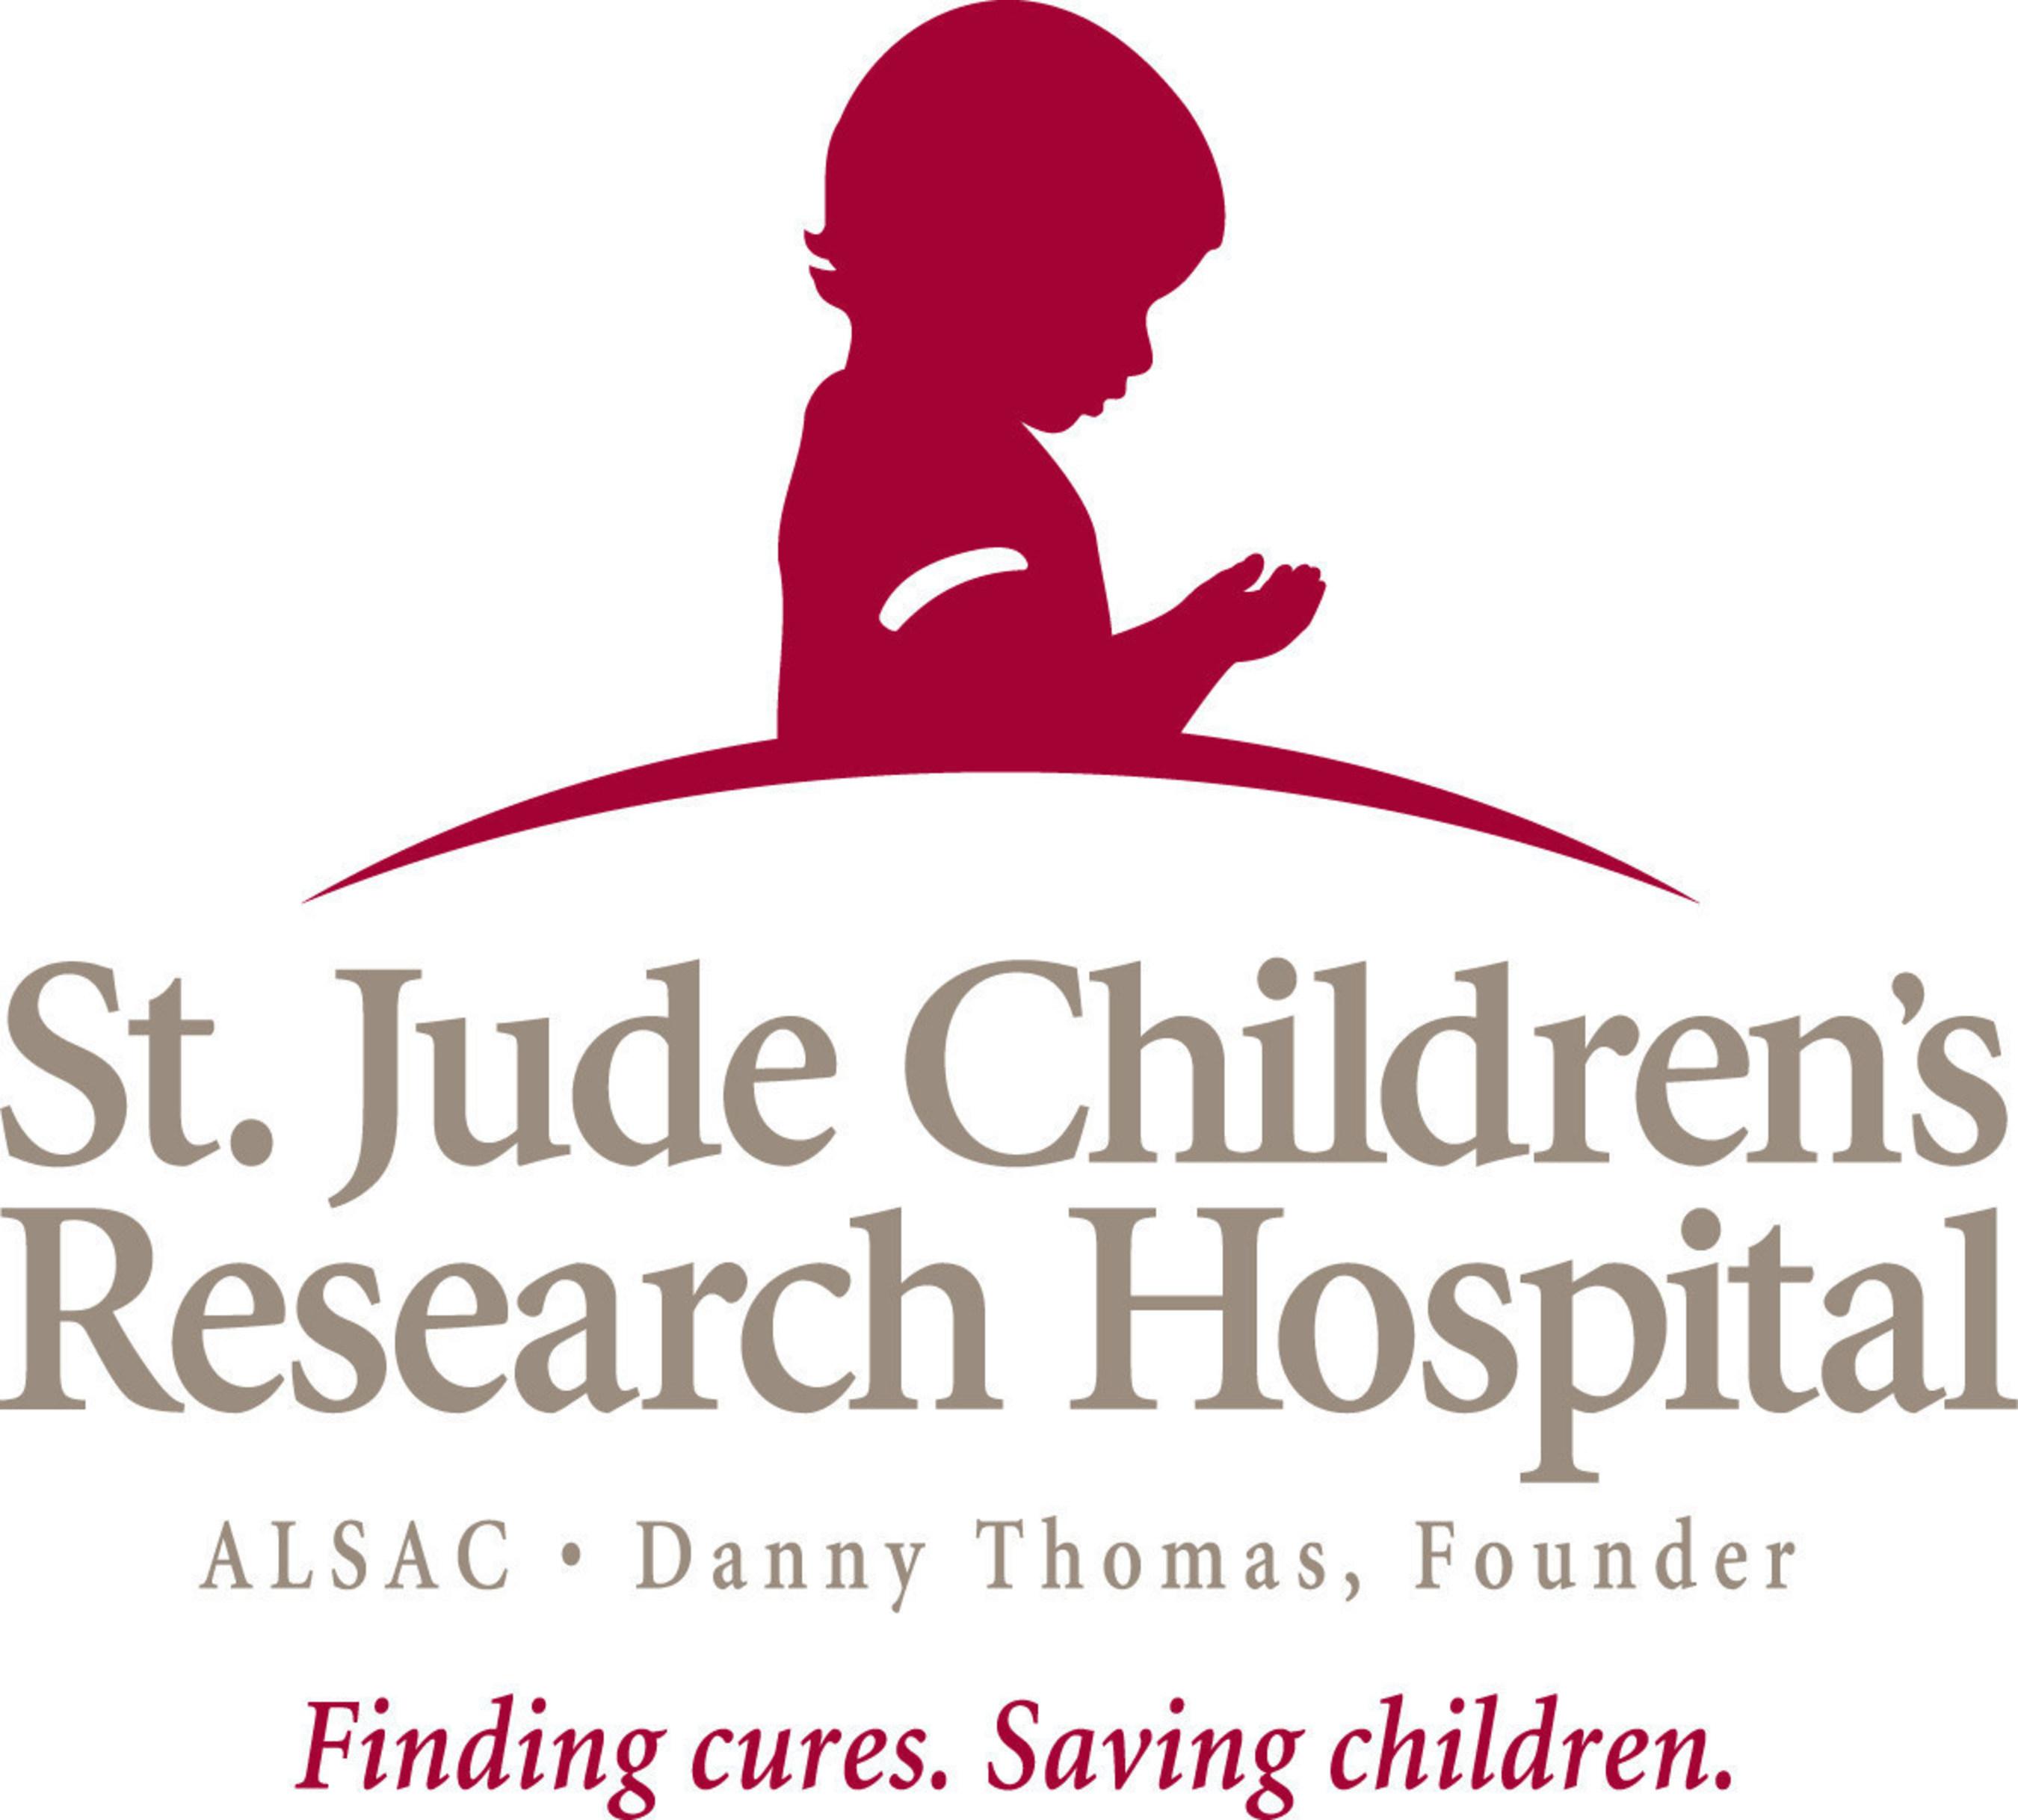 Western Refining raises $847,811 for St. Jude Children's Research Hospital® during 'Monster'